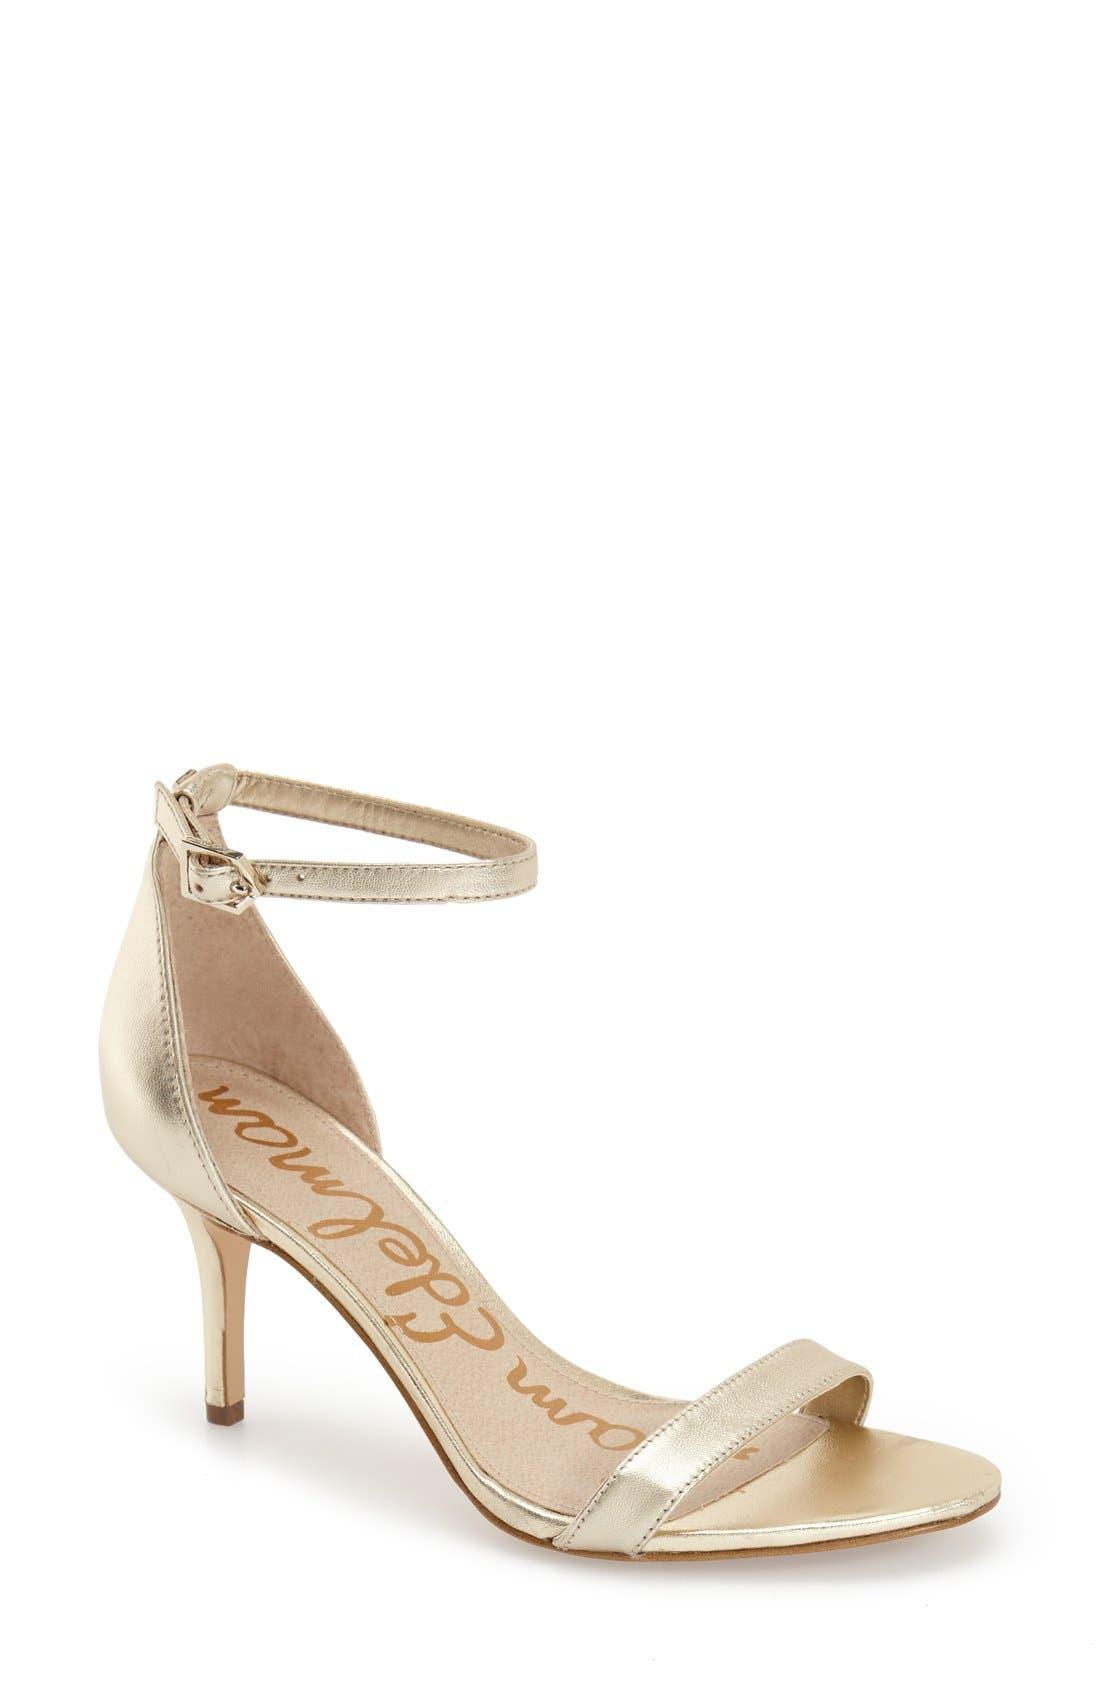 ,                             'Patti' Ankle Strap Sandal,                             Main thumbnail 208, color,                             900